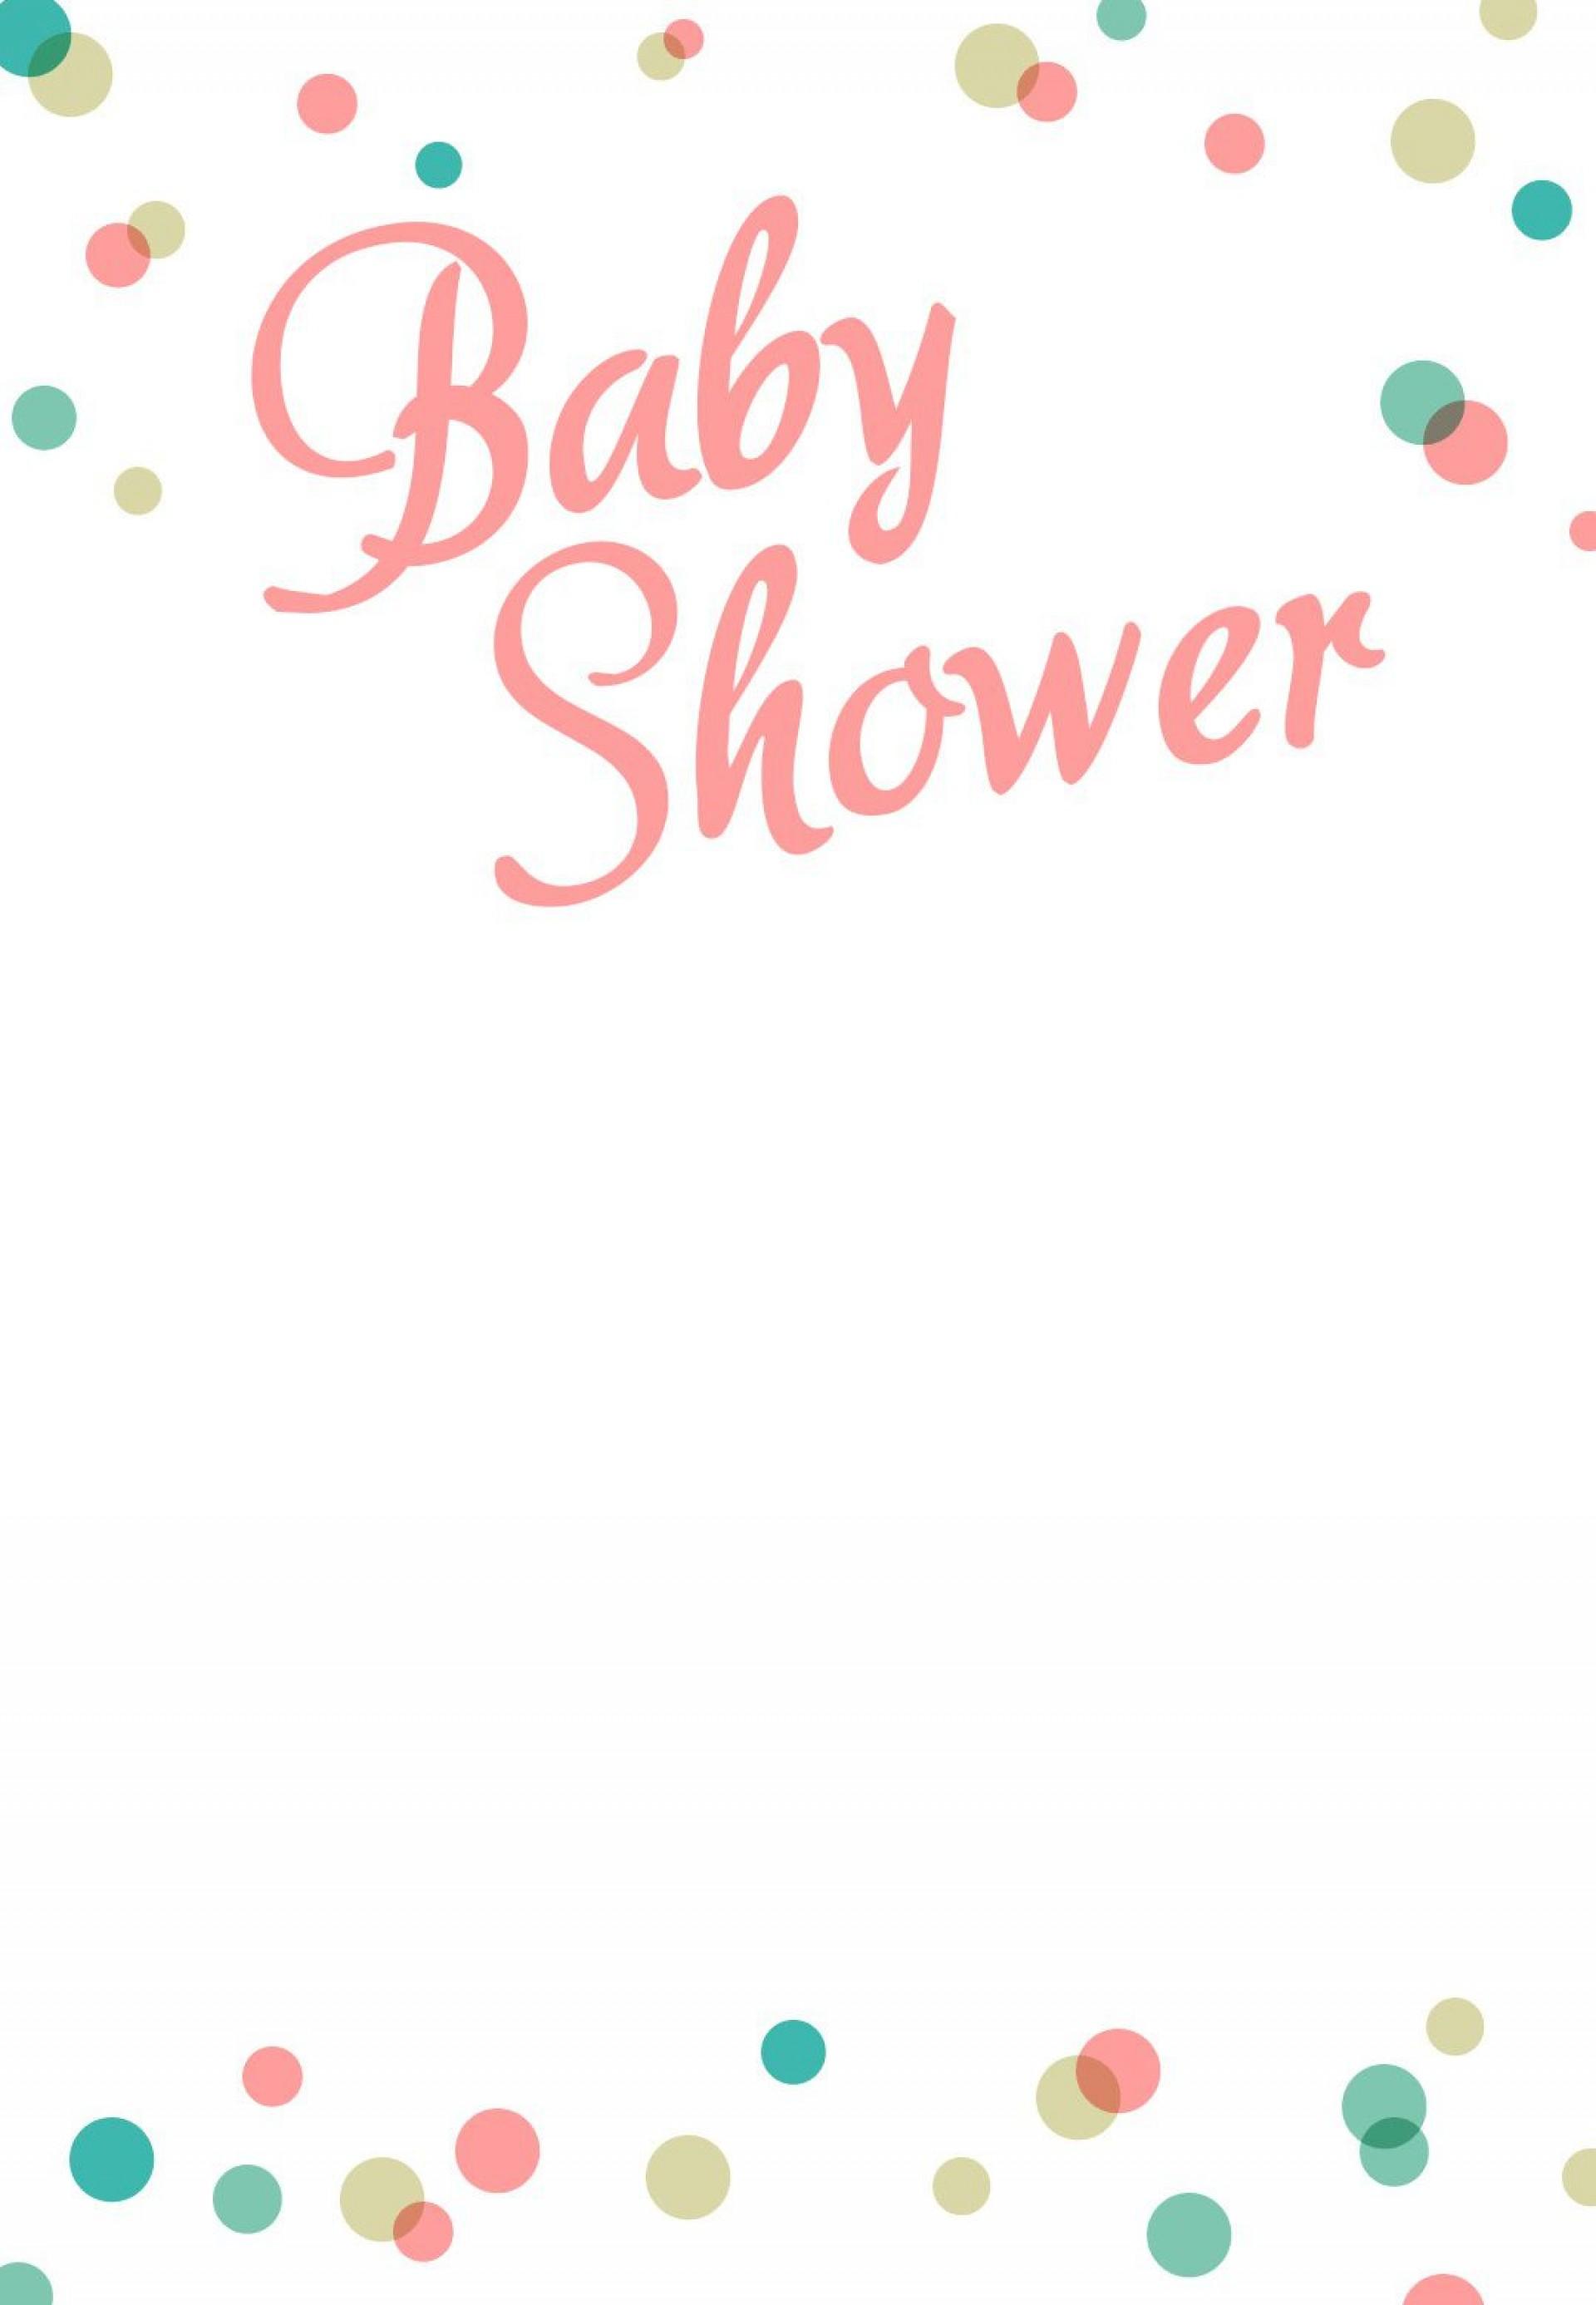 006 Unique Baby Shower Template Free Printable Highest Quality  Superhero Invitation For A Boy Diaper1920